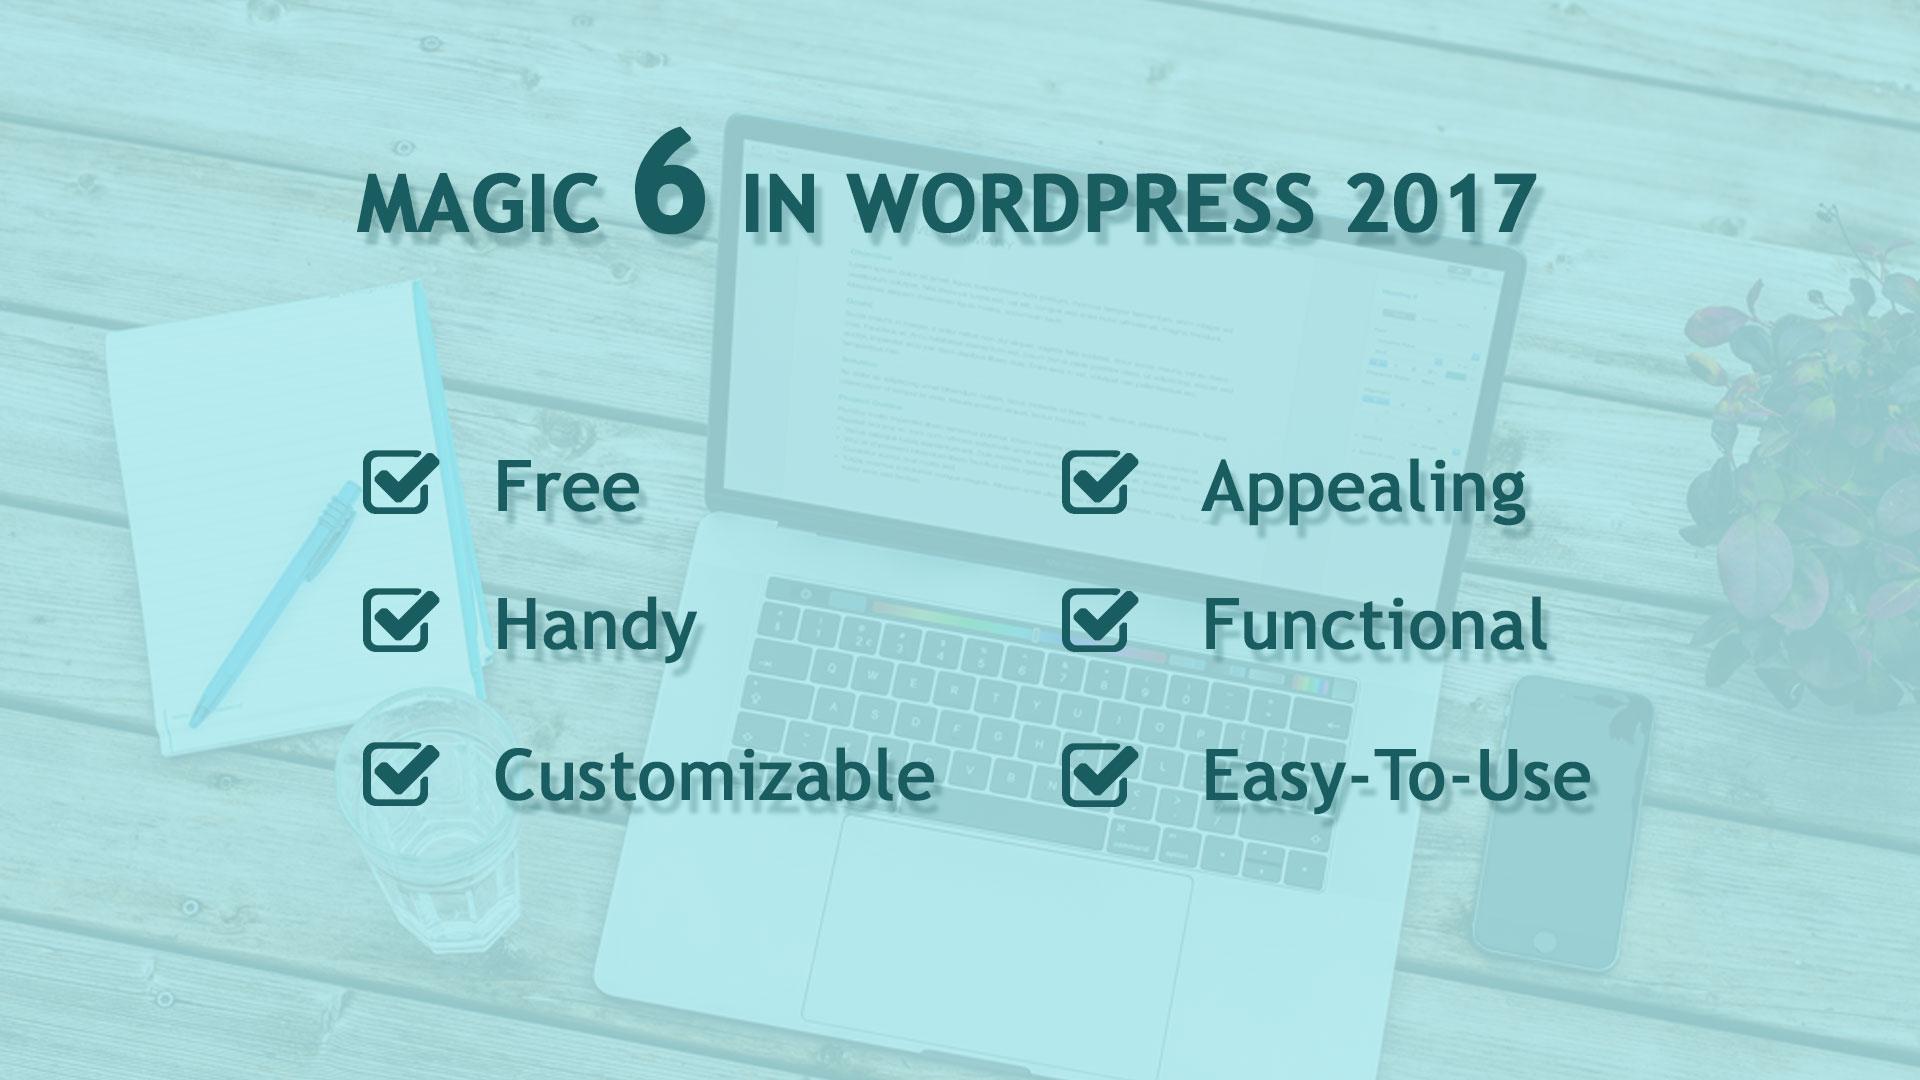 Top 6 Free WordPress Themes Of 2017